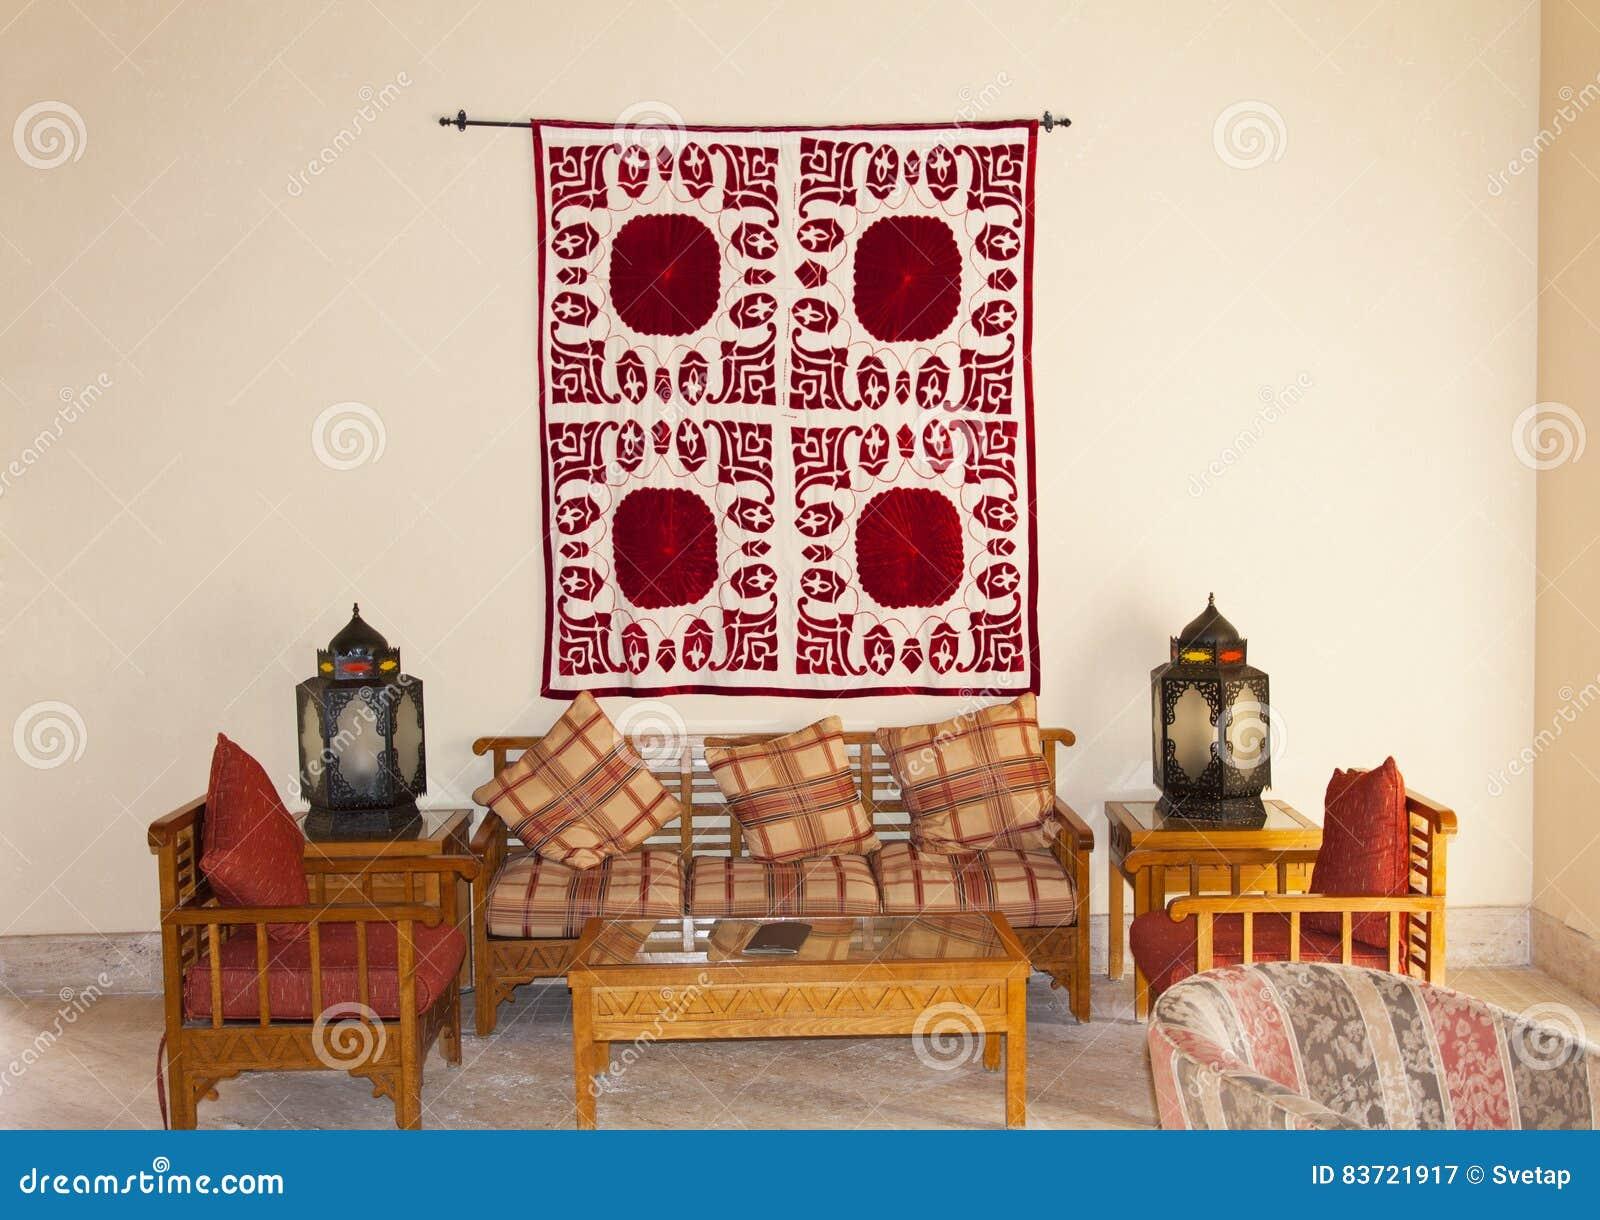 Vintage Turkish Arabian Or Indian Lantern Interior. Pillow On Sofa  Decoration Interior With Morocco Style Photo.